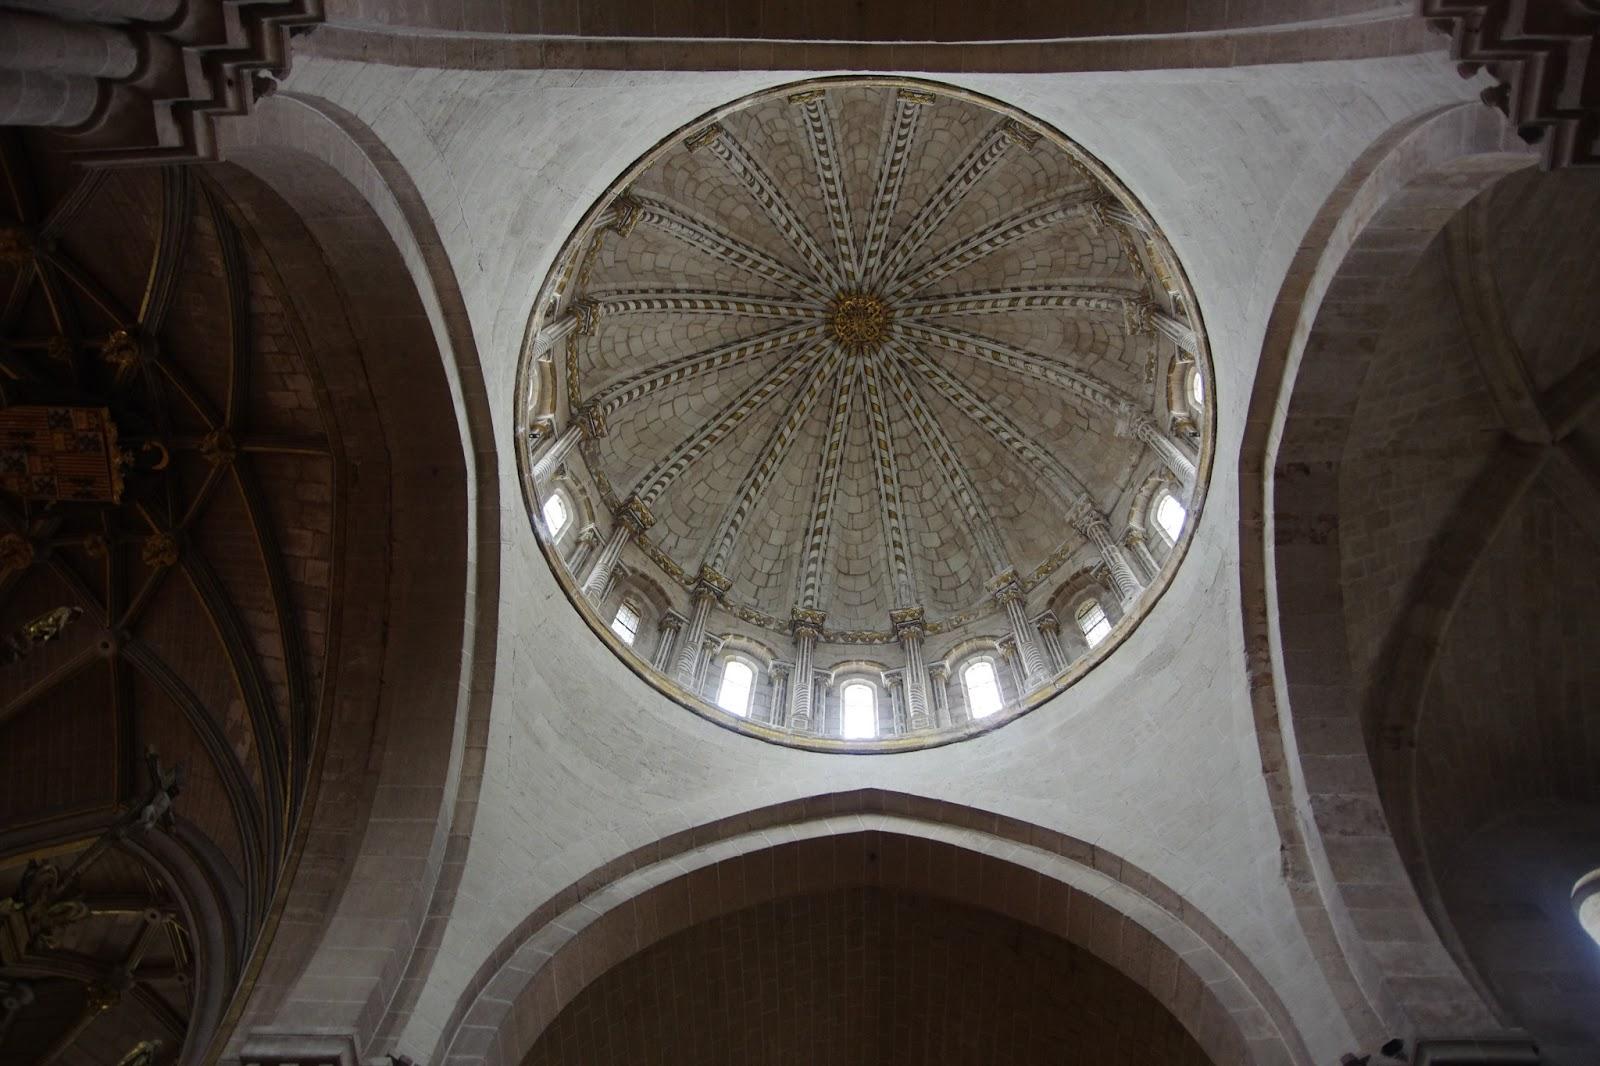 El mundo de juan mar a viajes y fotograf a zamora for Catedral de zamora interior